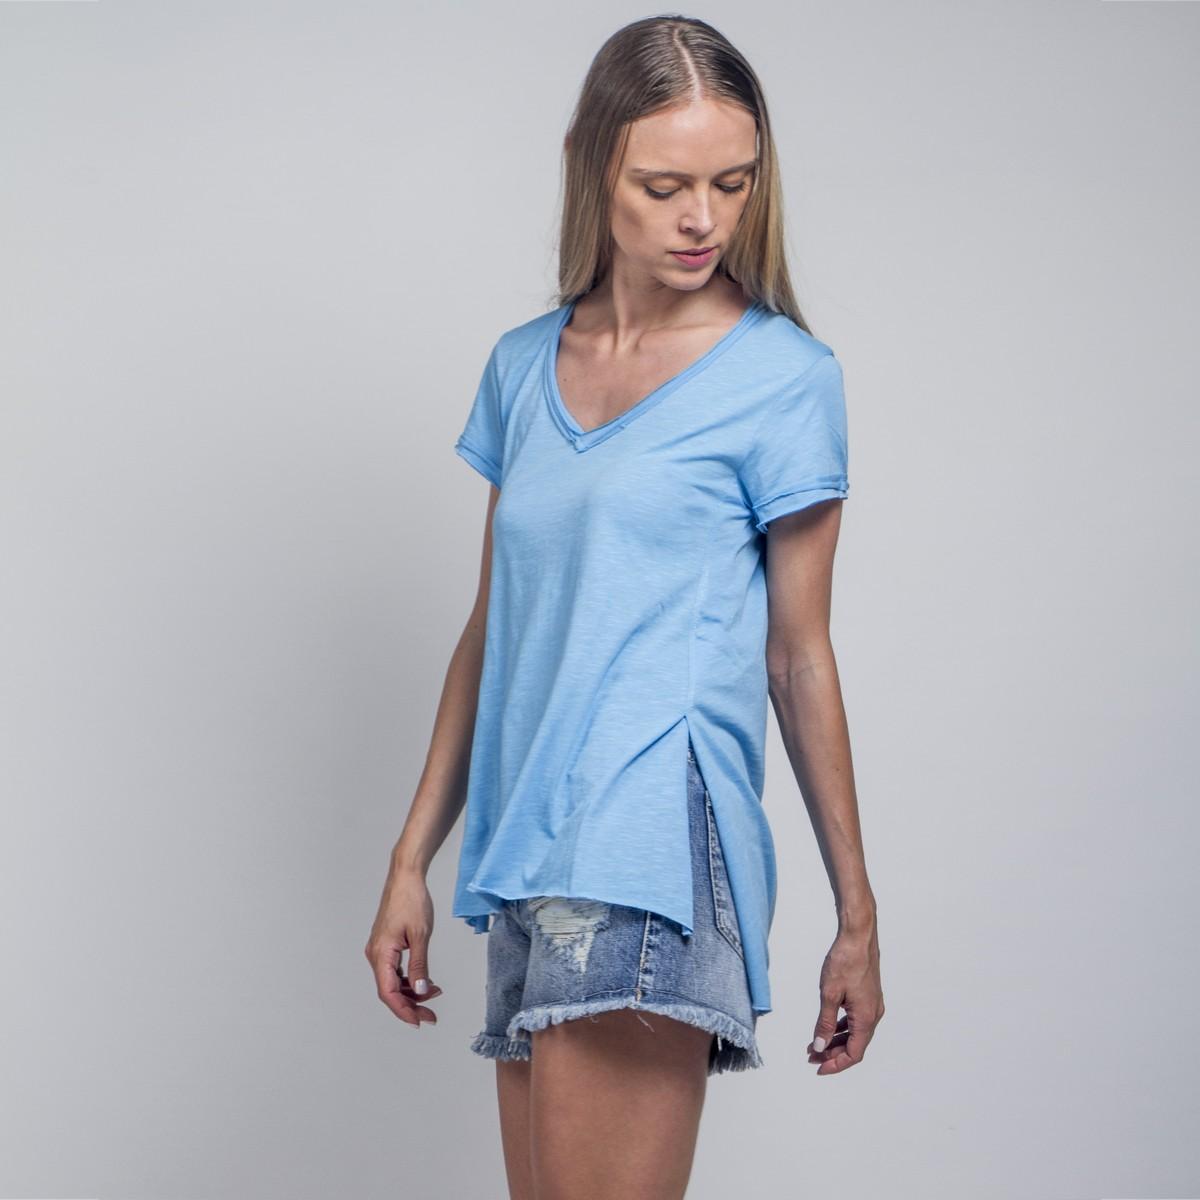 ee041bb41967 Ασύμμετρο tshirt με σκισίματα - Γυναικεία Ρούχα - Φορέματα - Xanashop